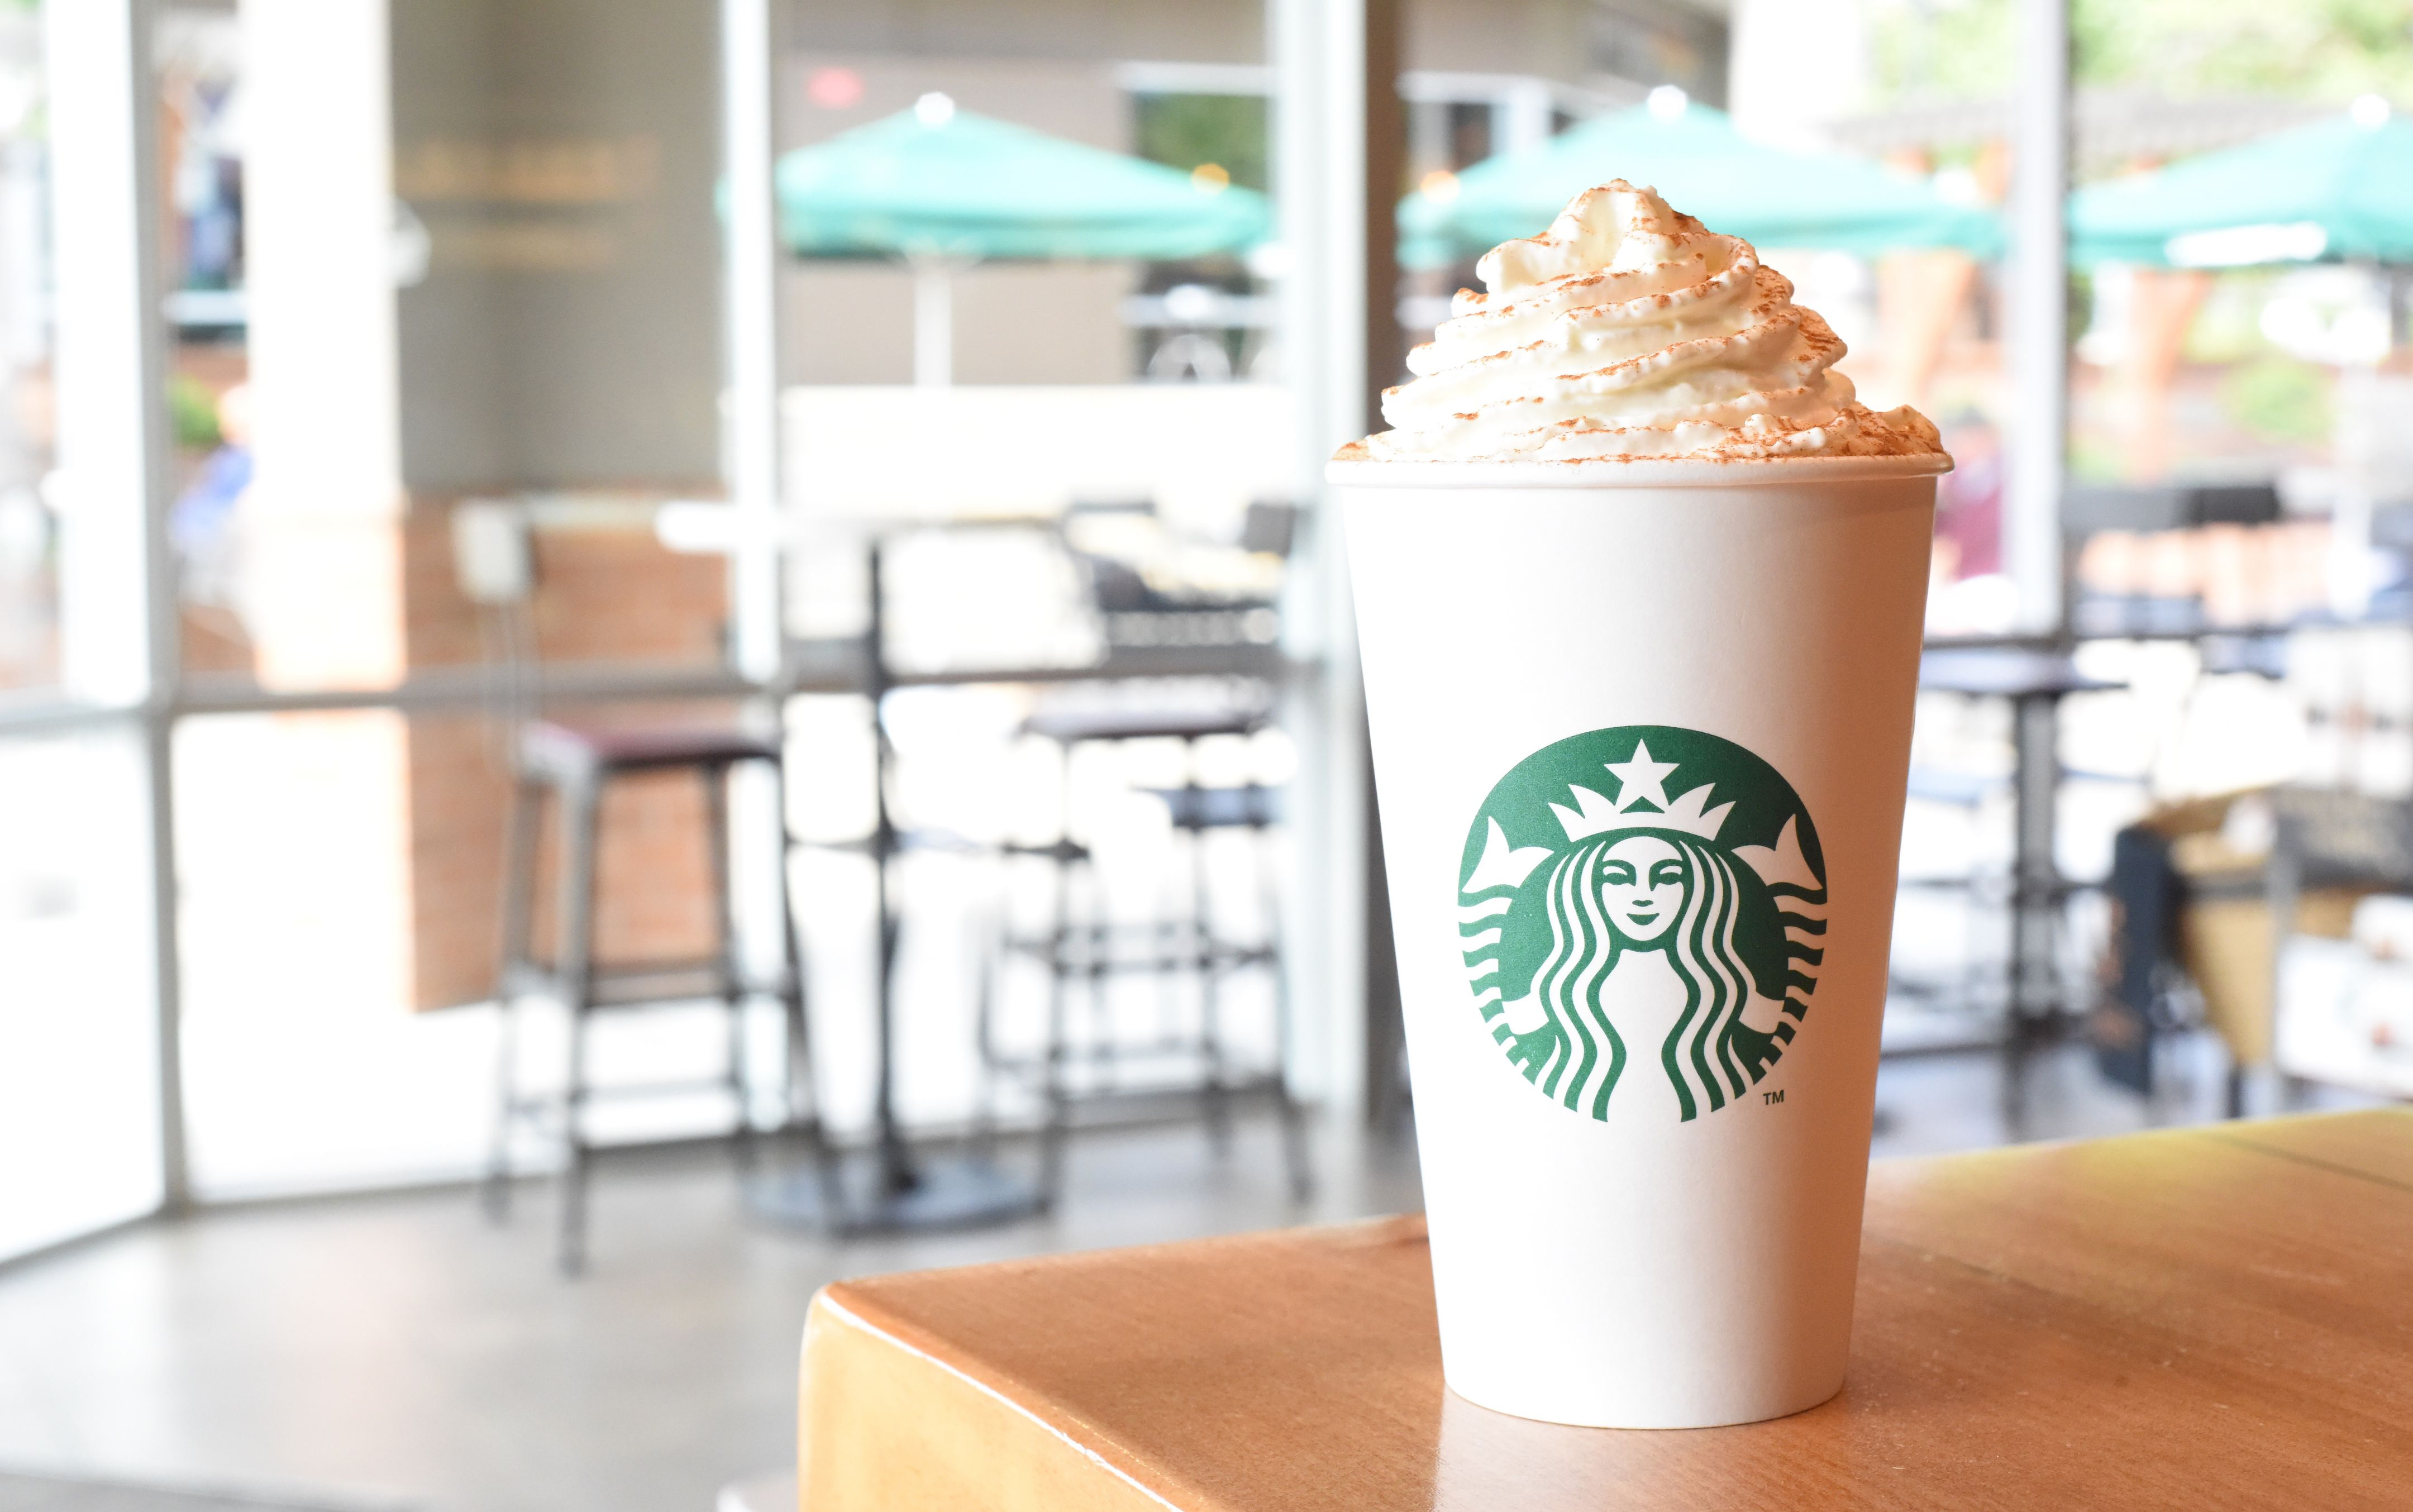 Starbucks' Pumpkin Spice Latte Is Returning To Stores August 27